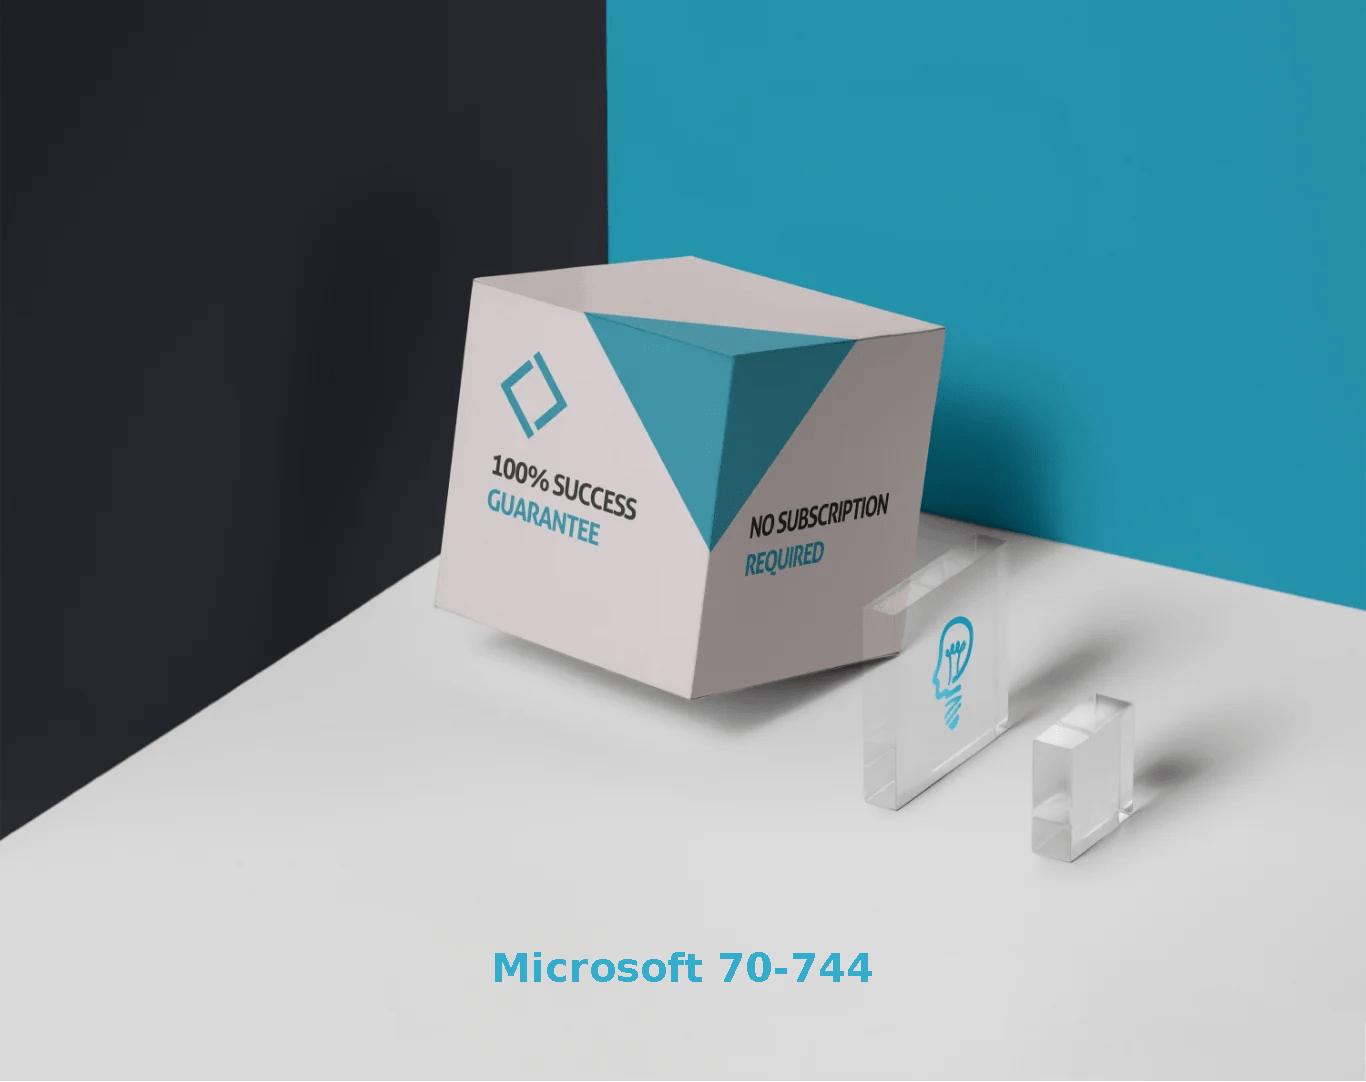 Microsoft 70-744 Exams